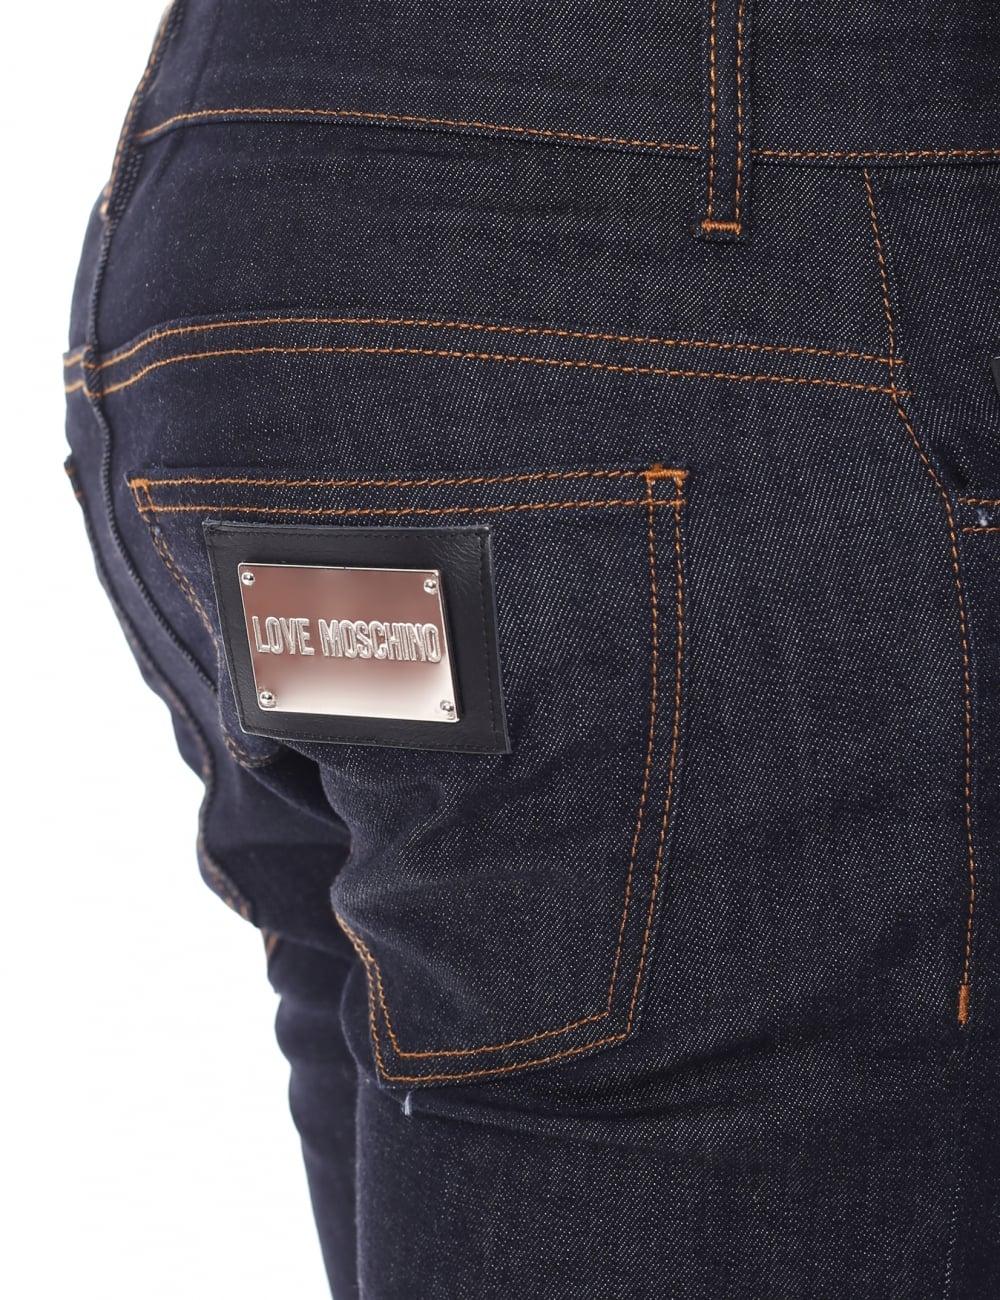 171a09d44a Love Moschino MQ421 Men's Slim Fit Jeans